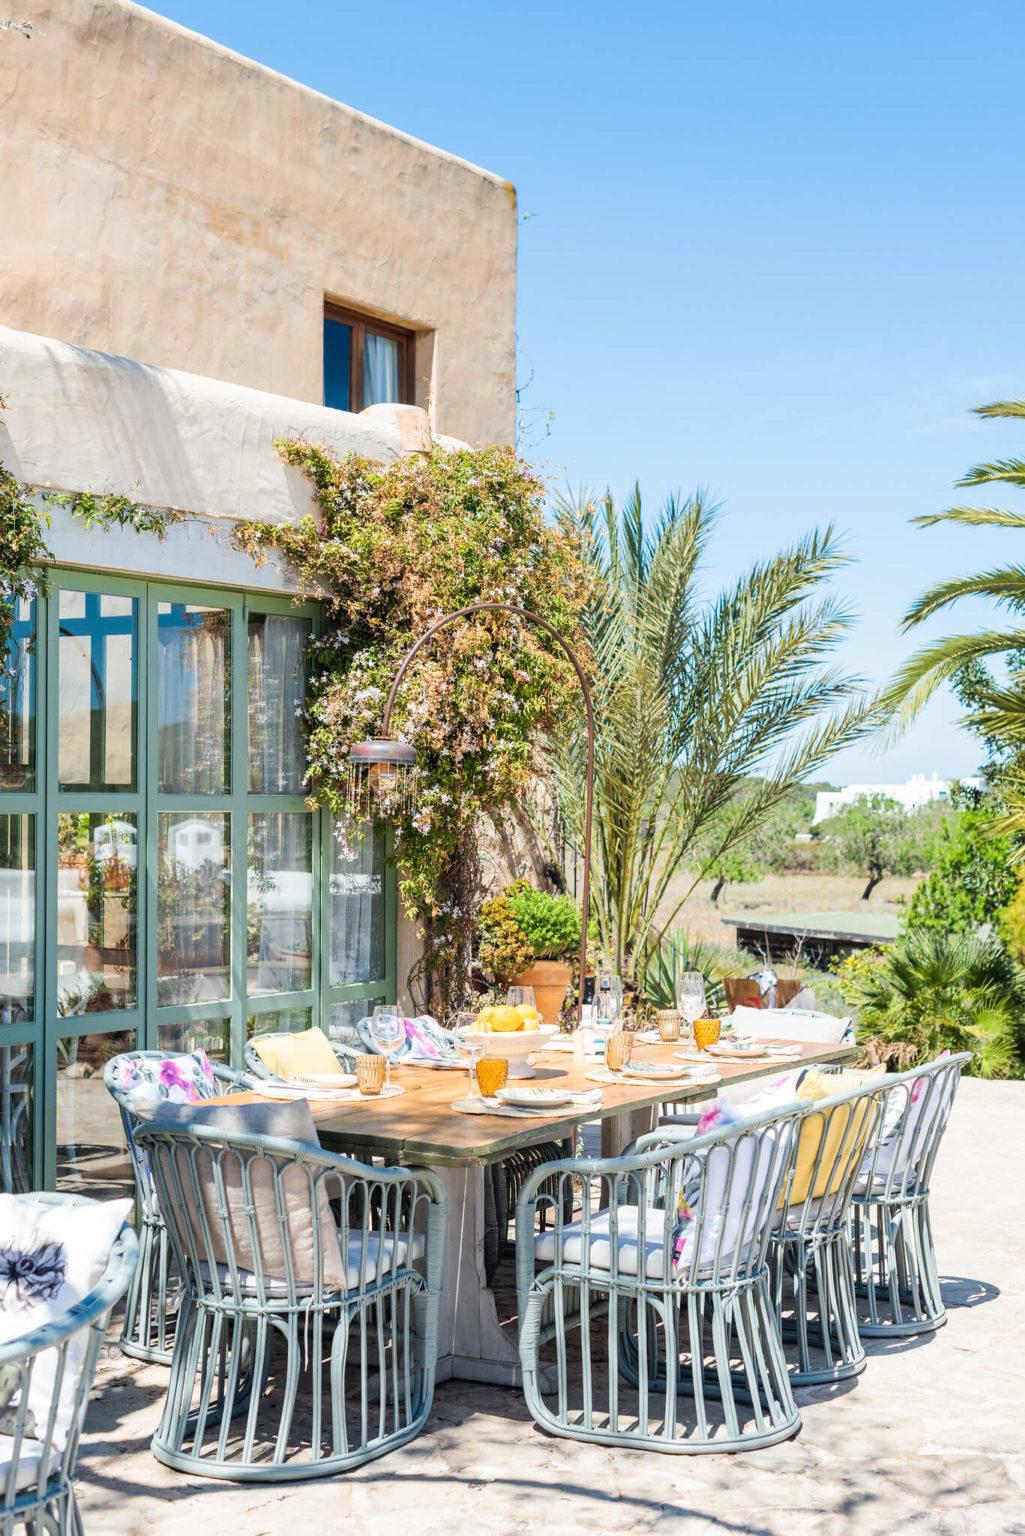 https://www.white-ibiza.com/wp-content/uploads/2020/03/white-ibiza-restaurants-es-cucons-08-1025x1536.jpg